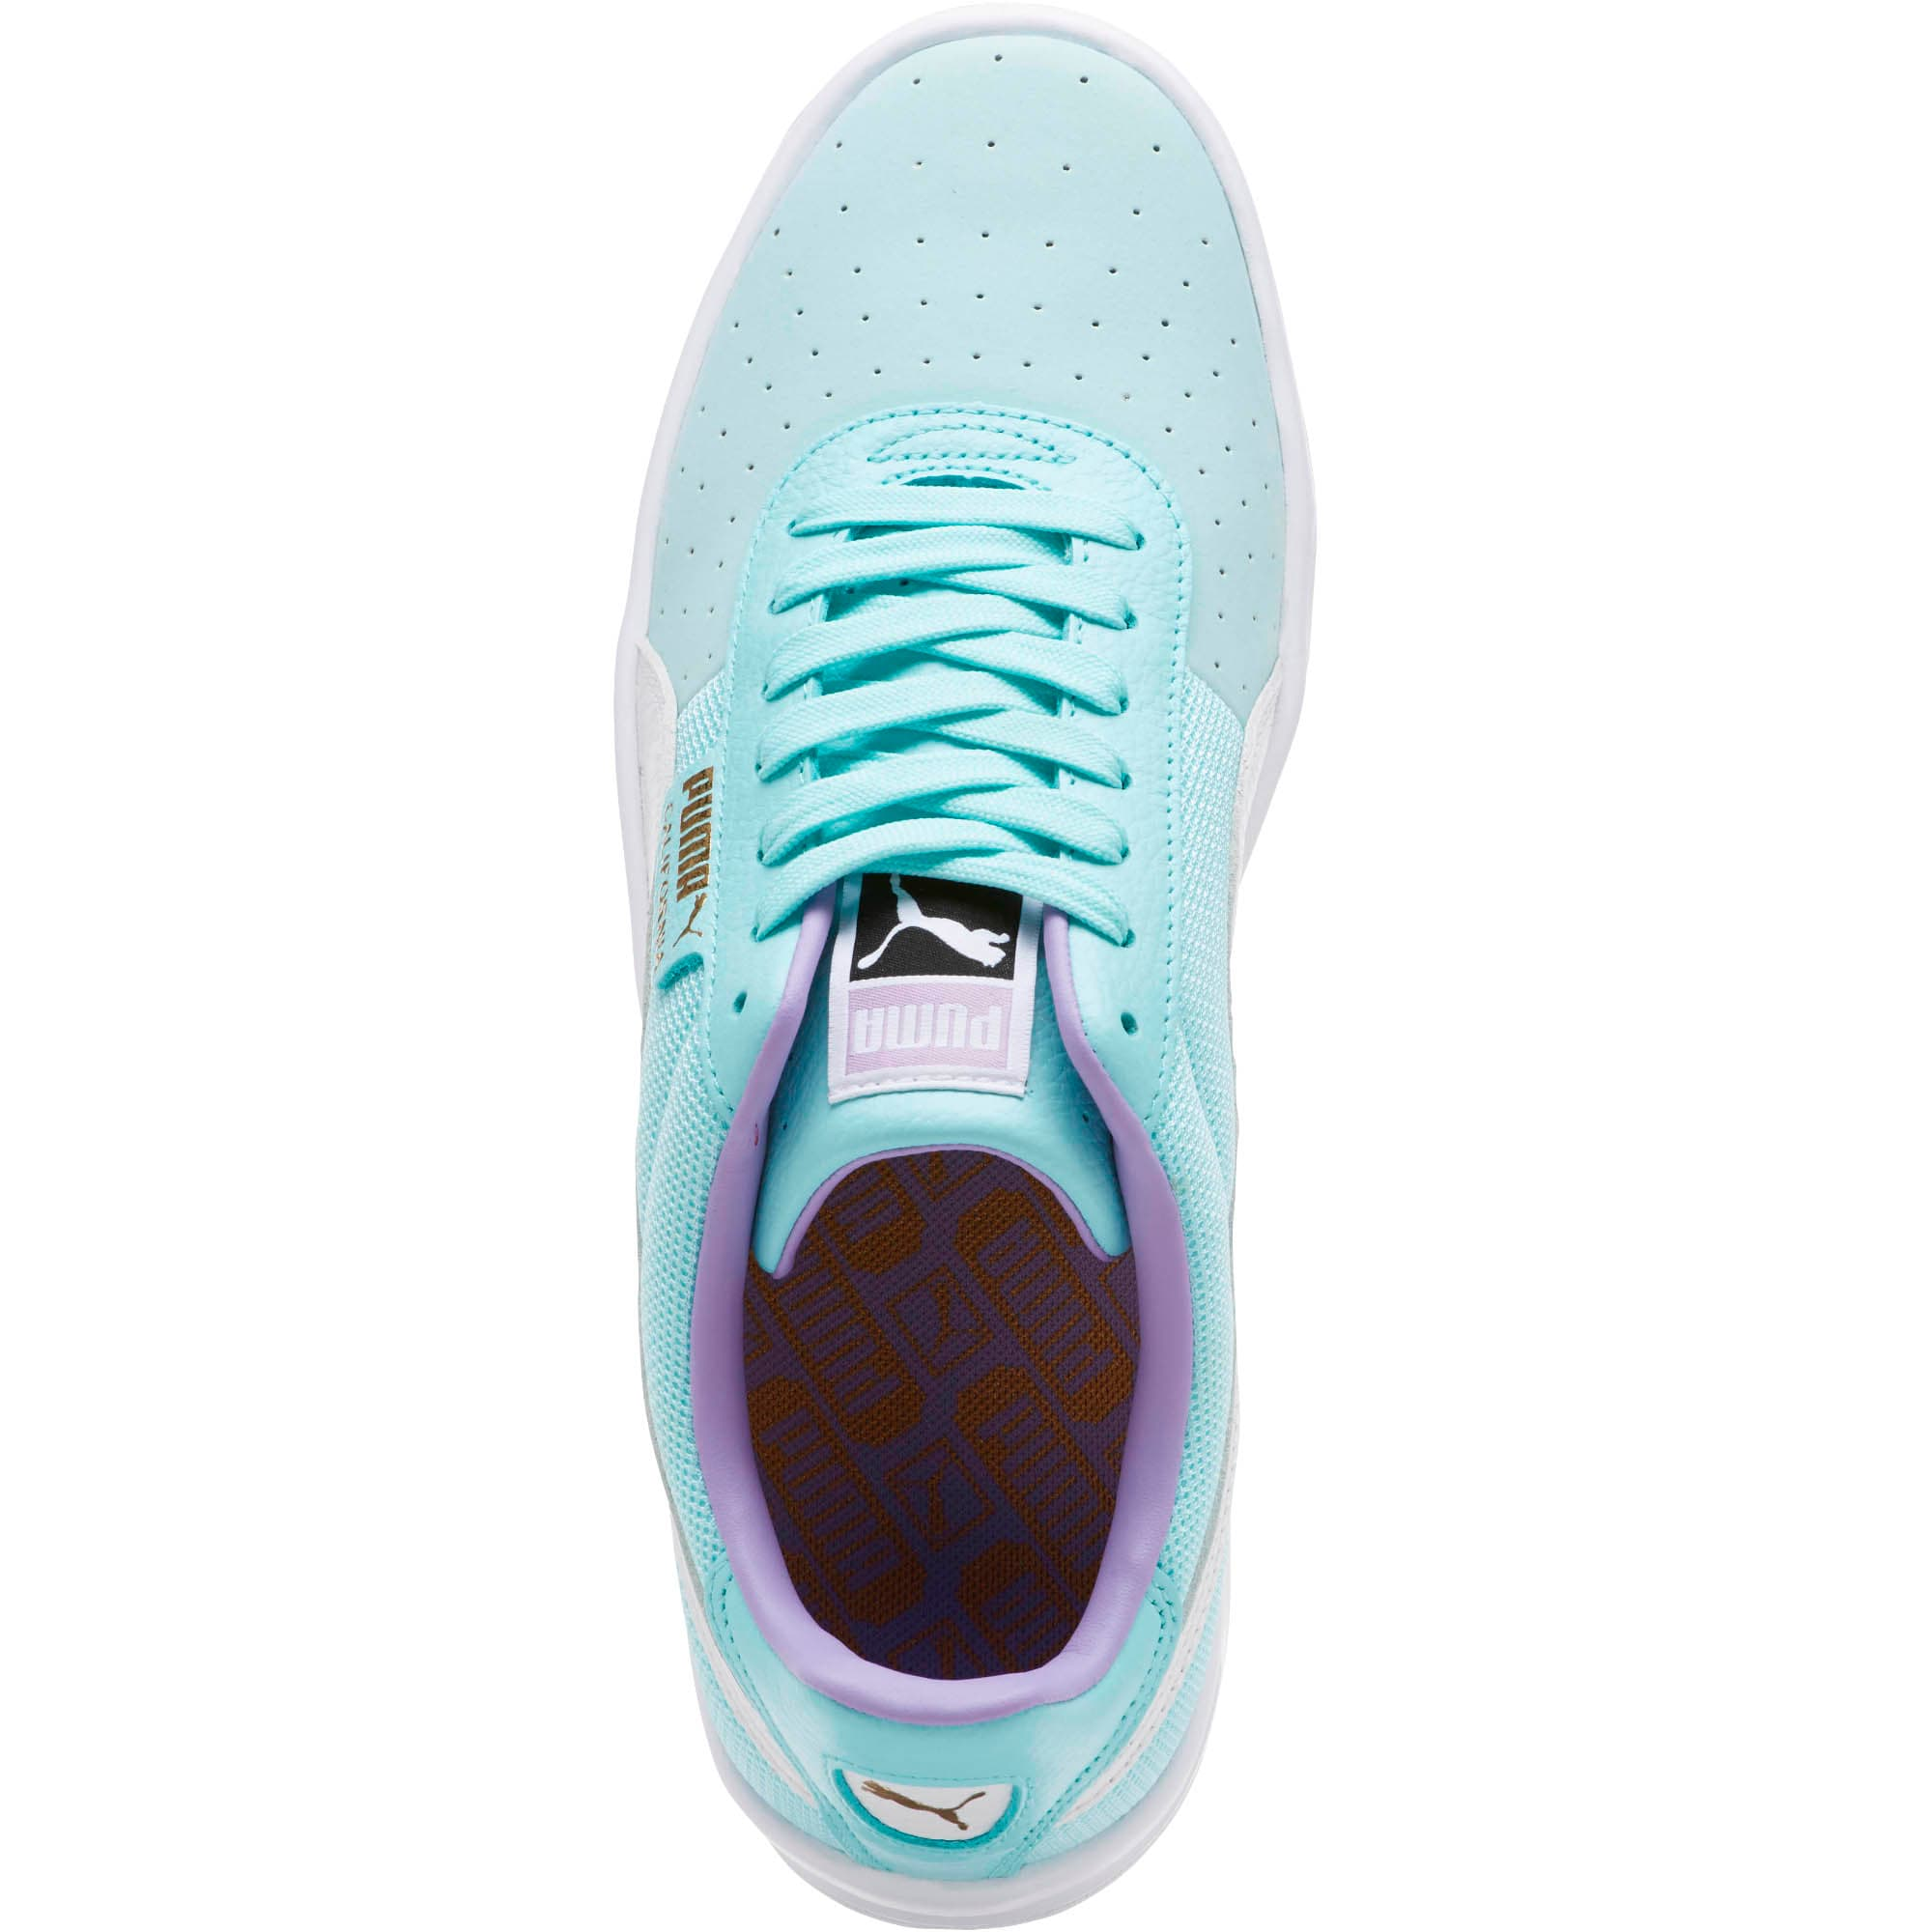 Thumbnail 5 of California Casual Sneakers, Island Paradise-P Wht-P Wht, medium